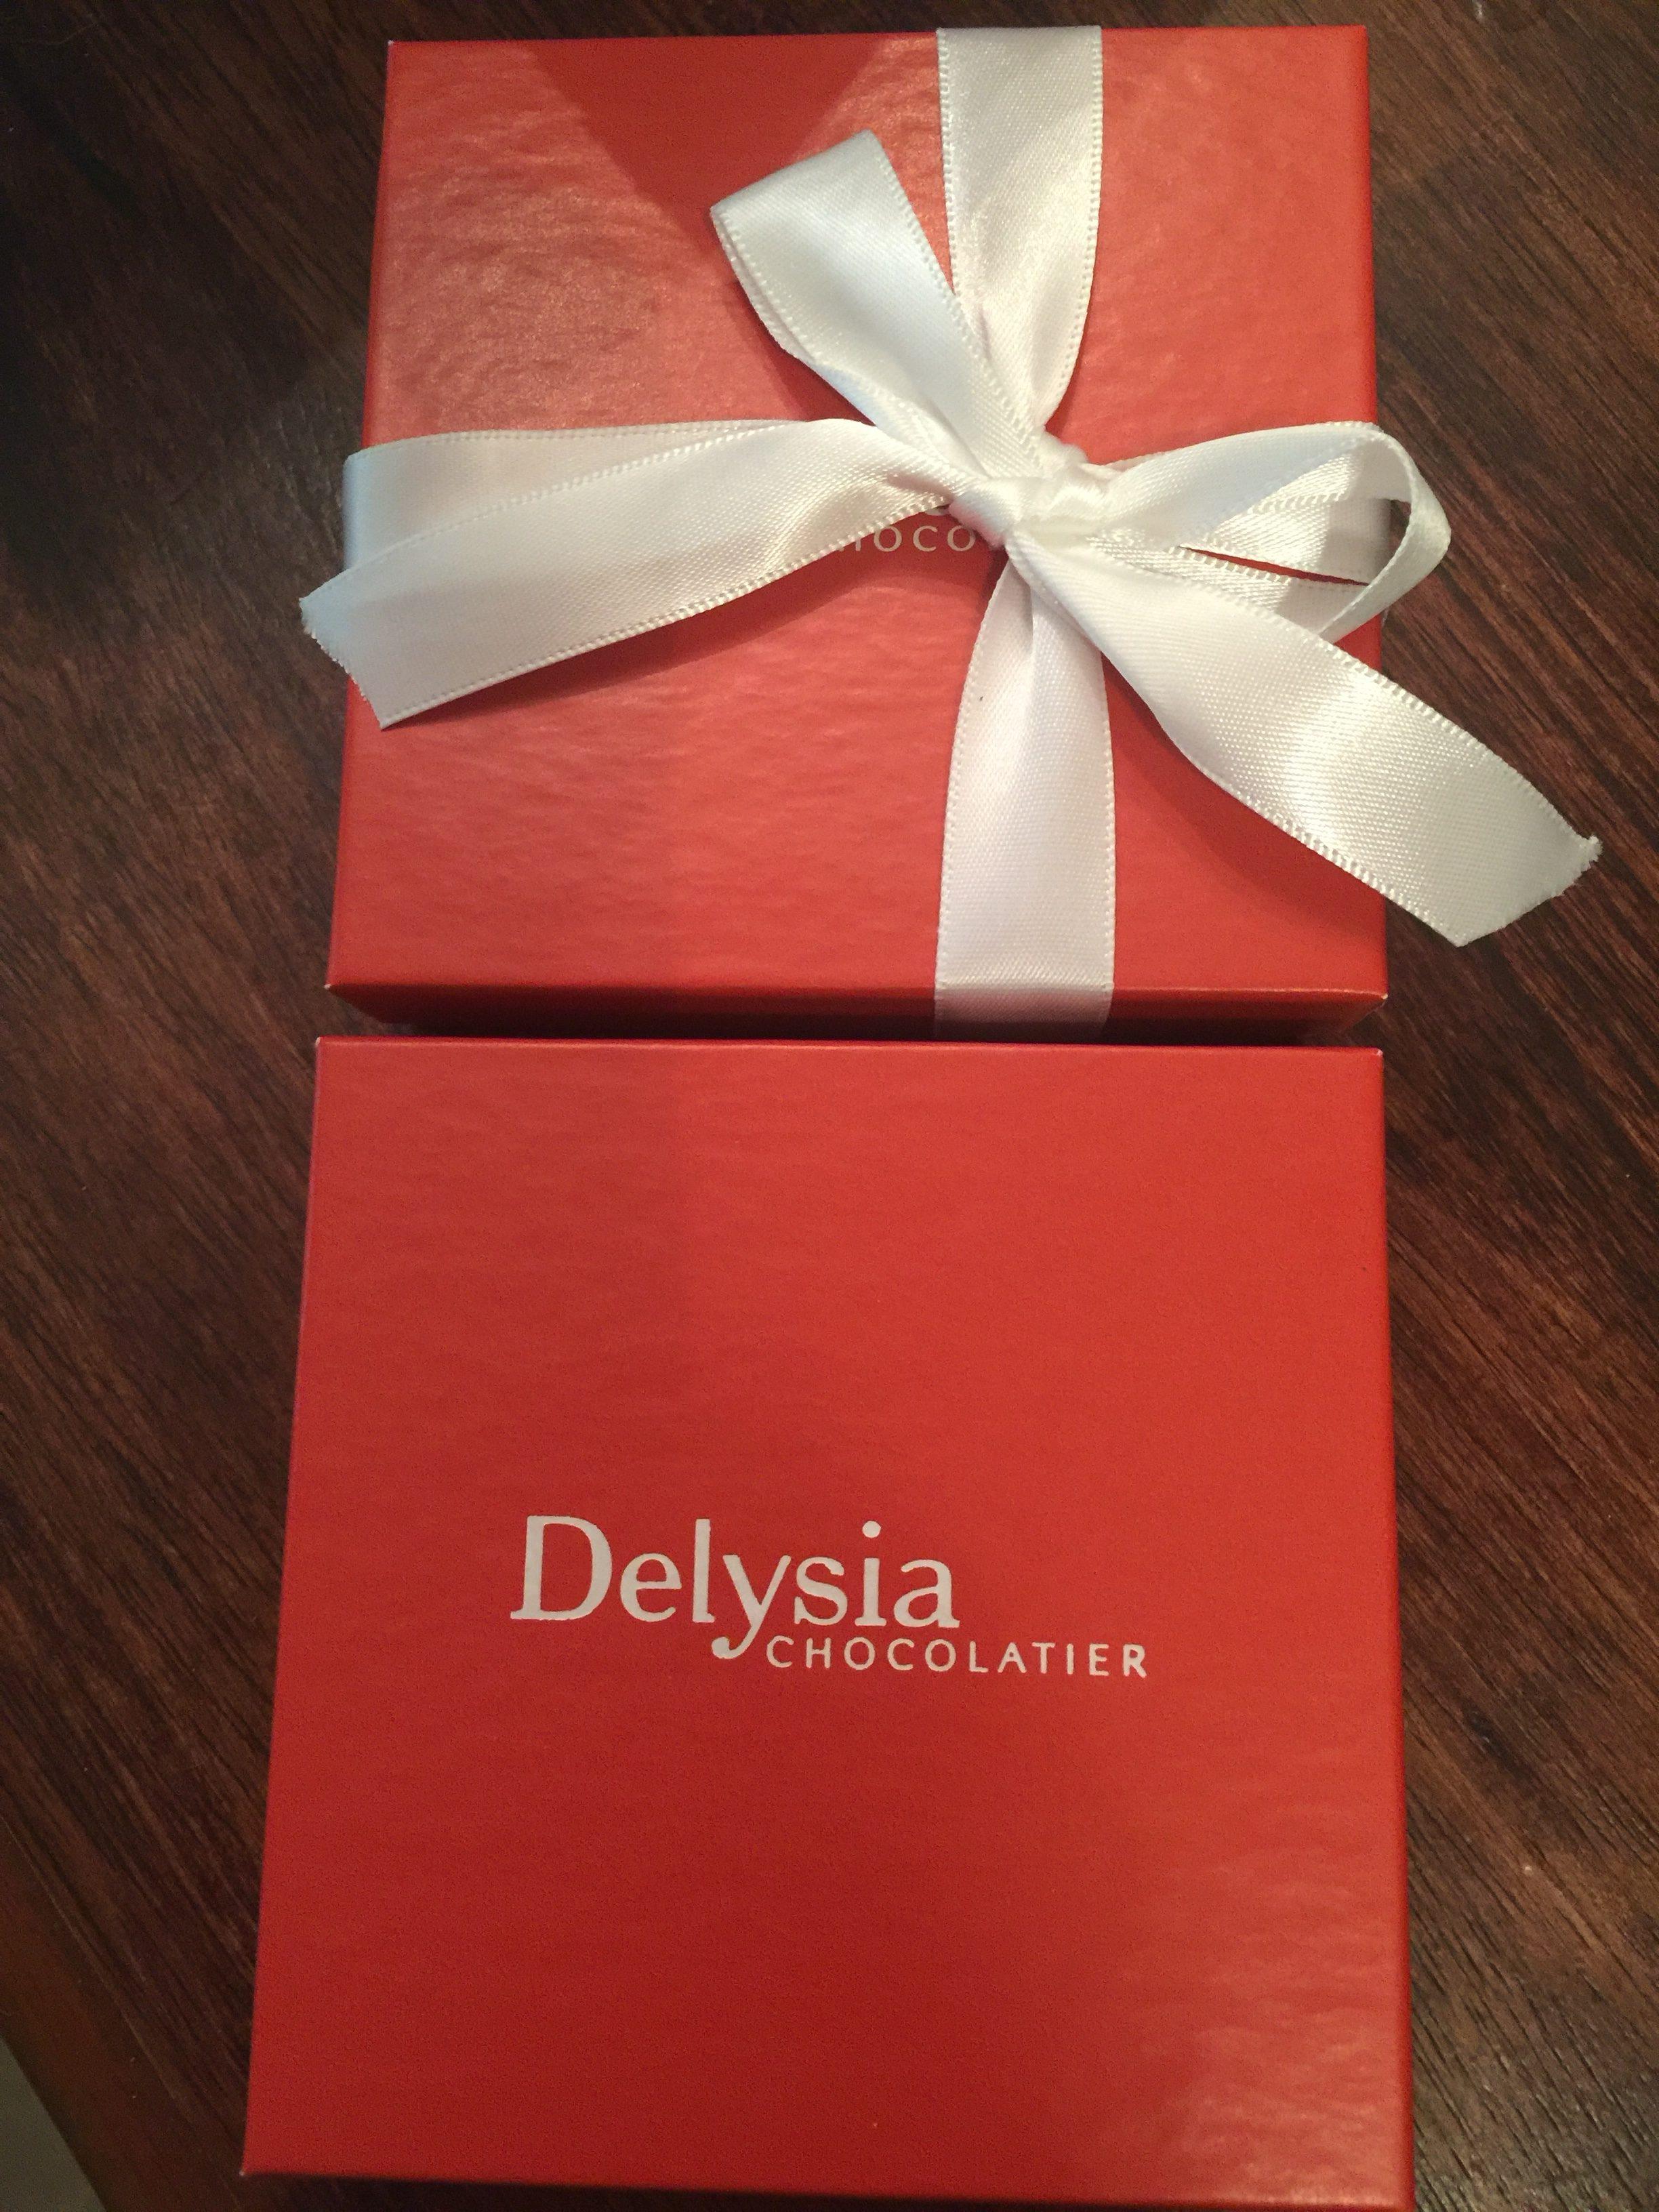 Delysia Chocolatier Review